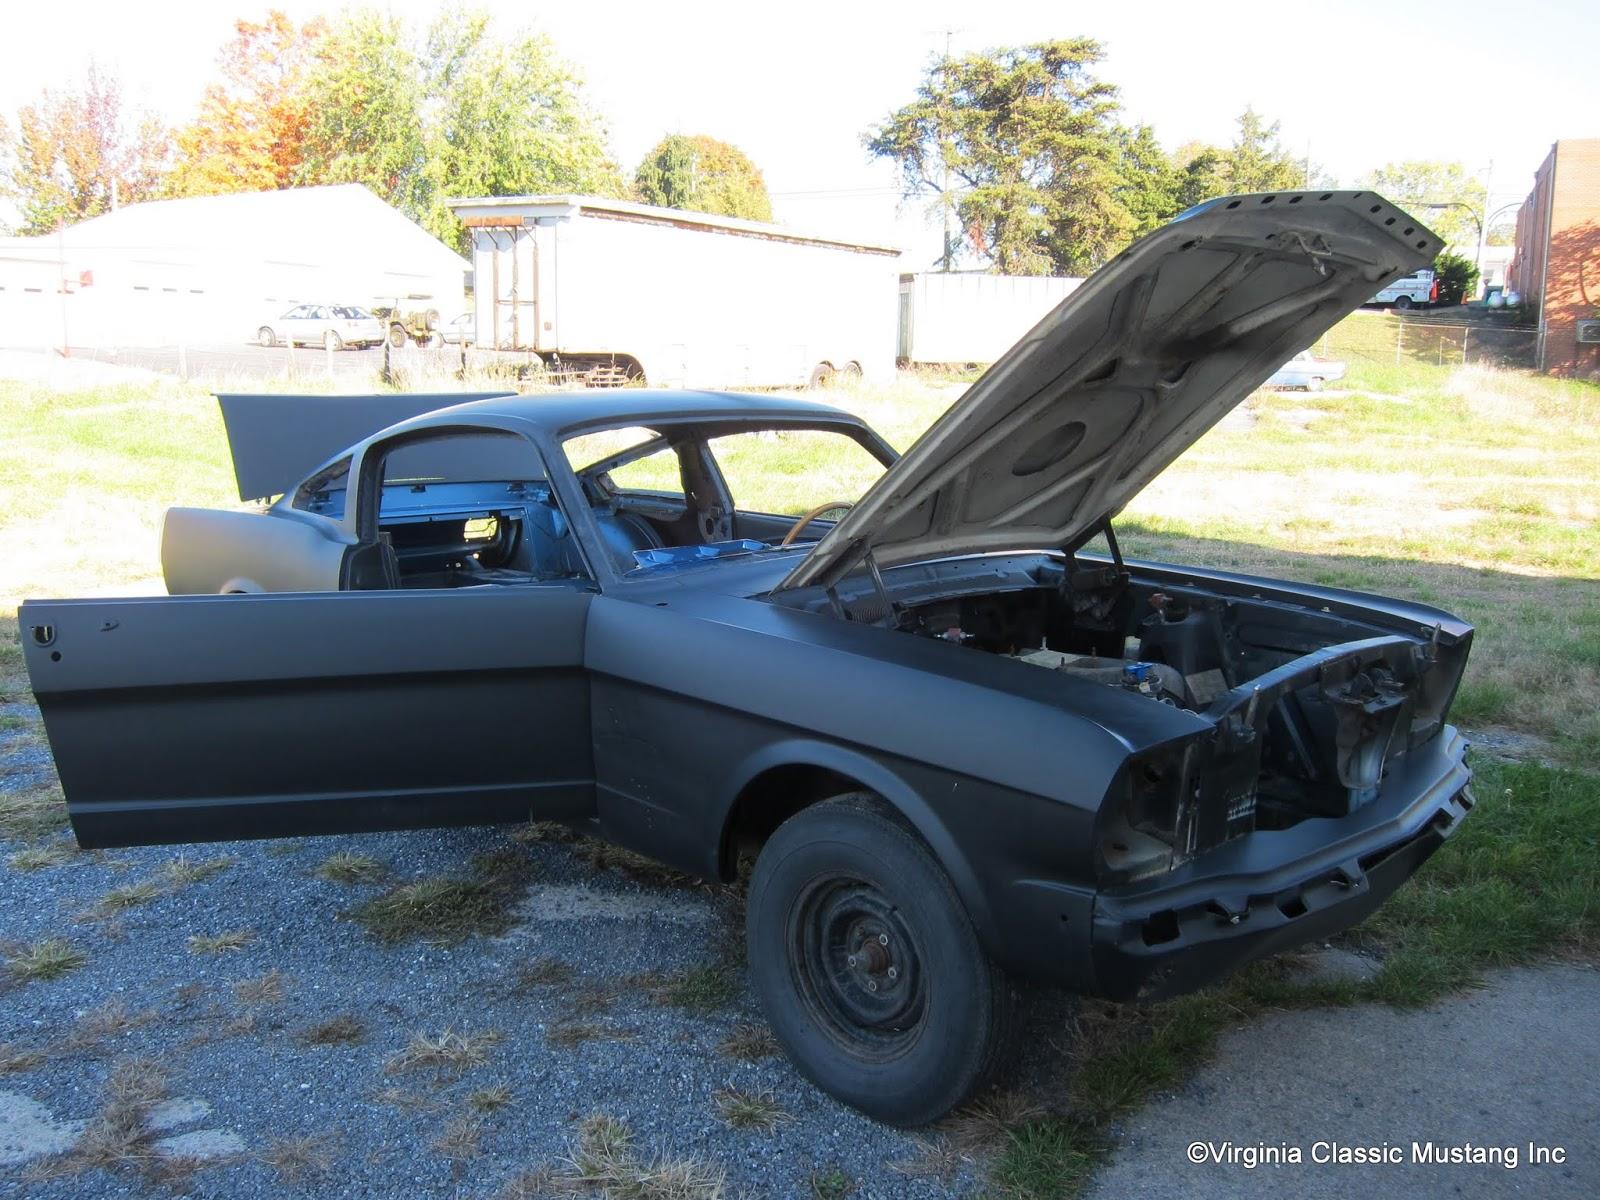 Virginia Clic Mustang Blog New Restoration Project 1966 Shelby Gt350